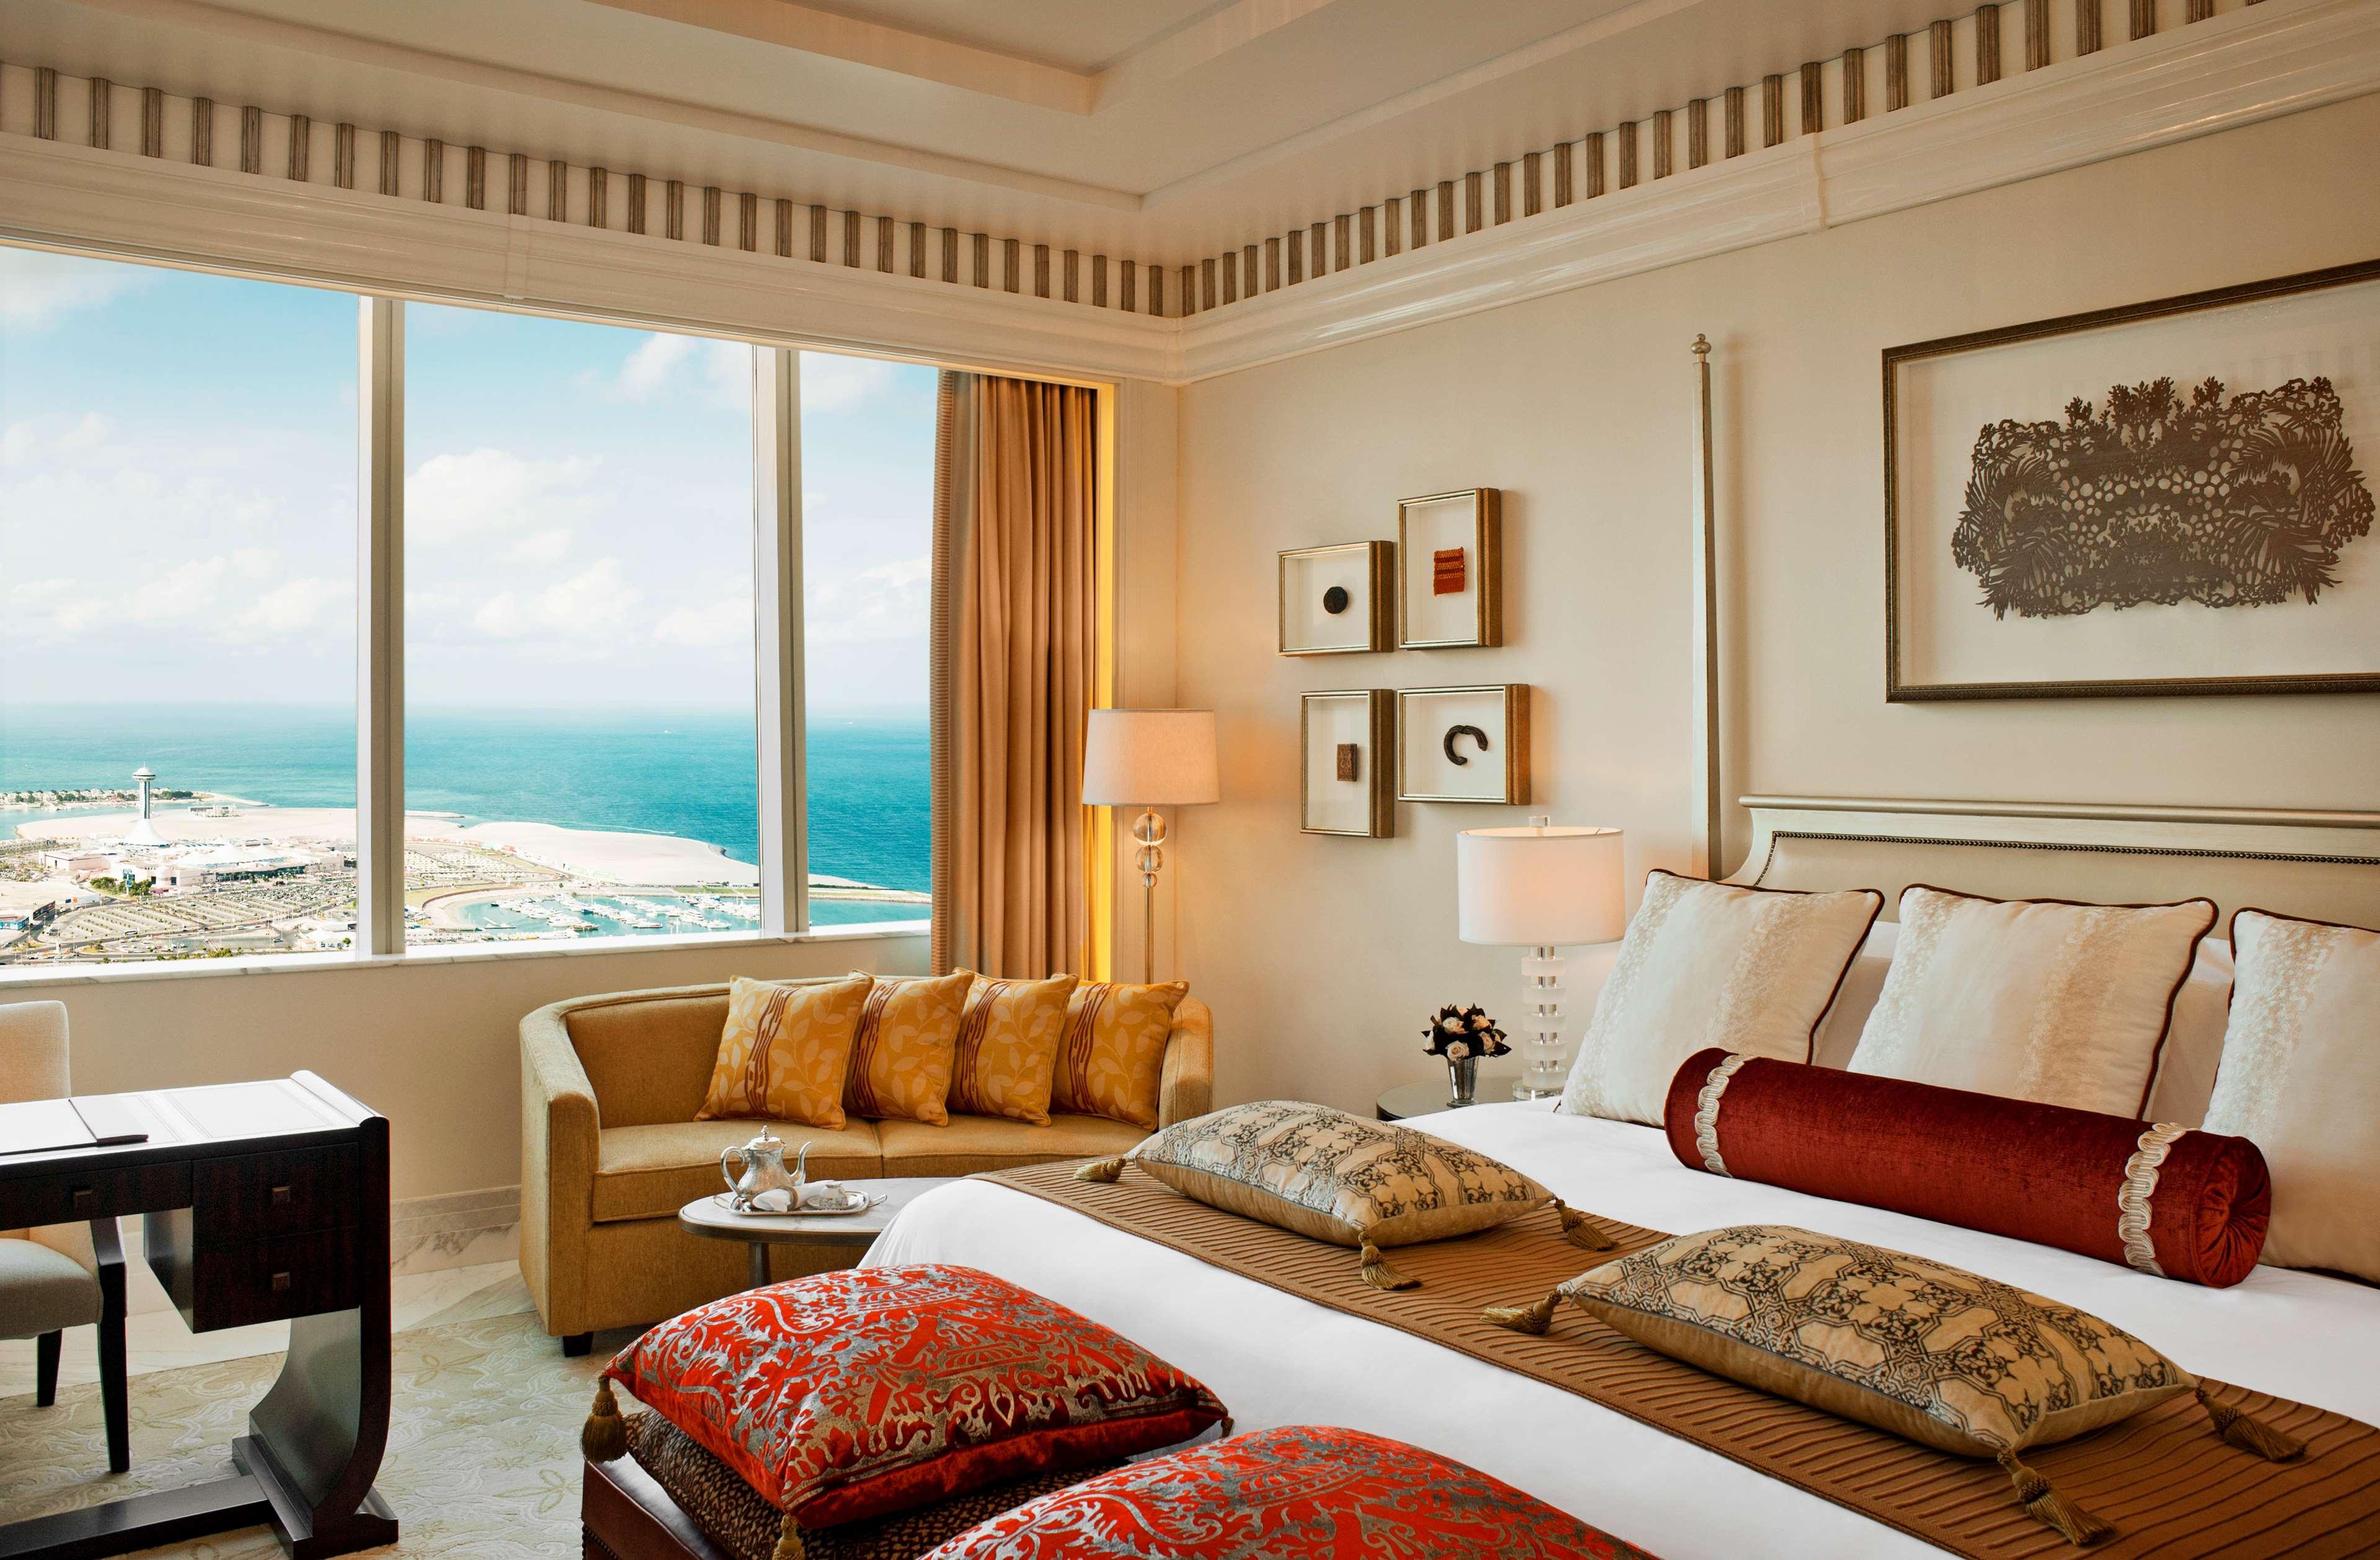 The St. Regis Abu Dhabi